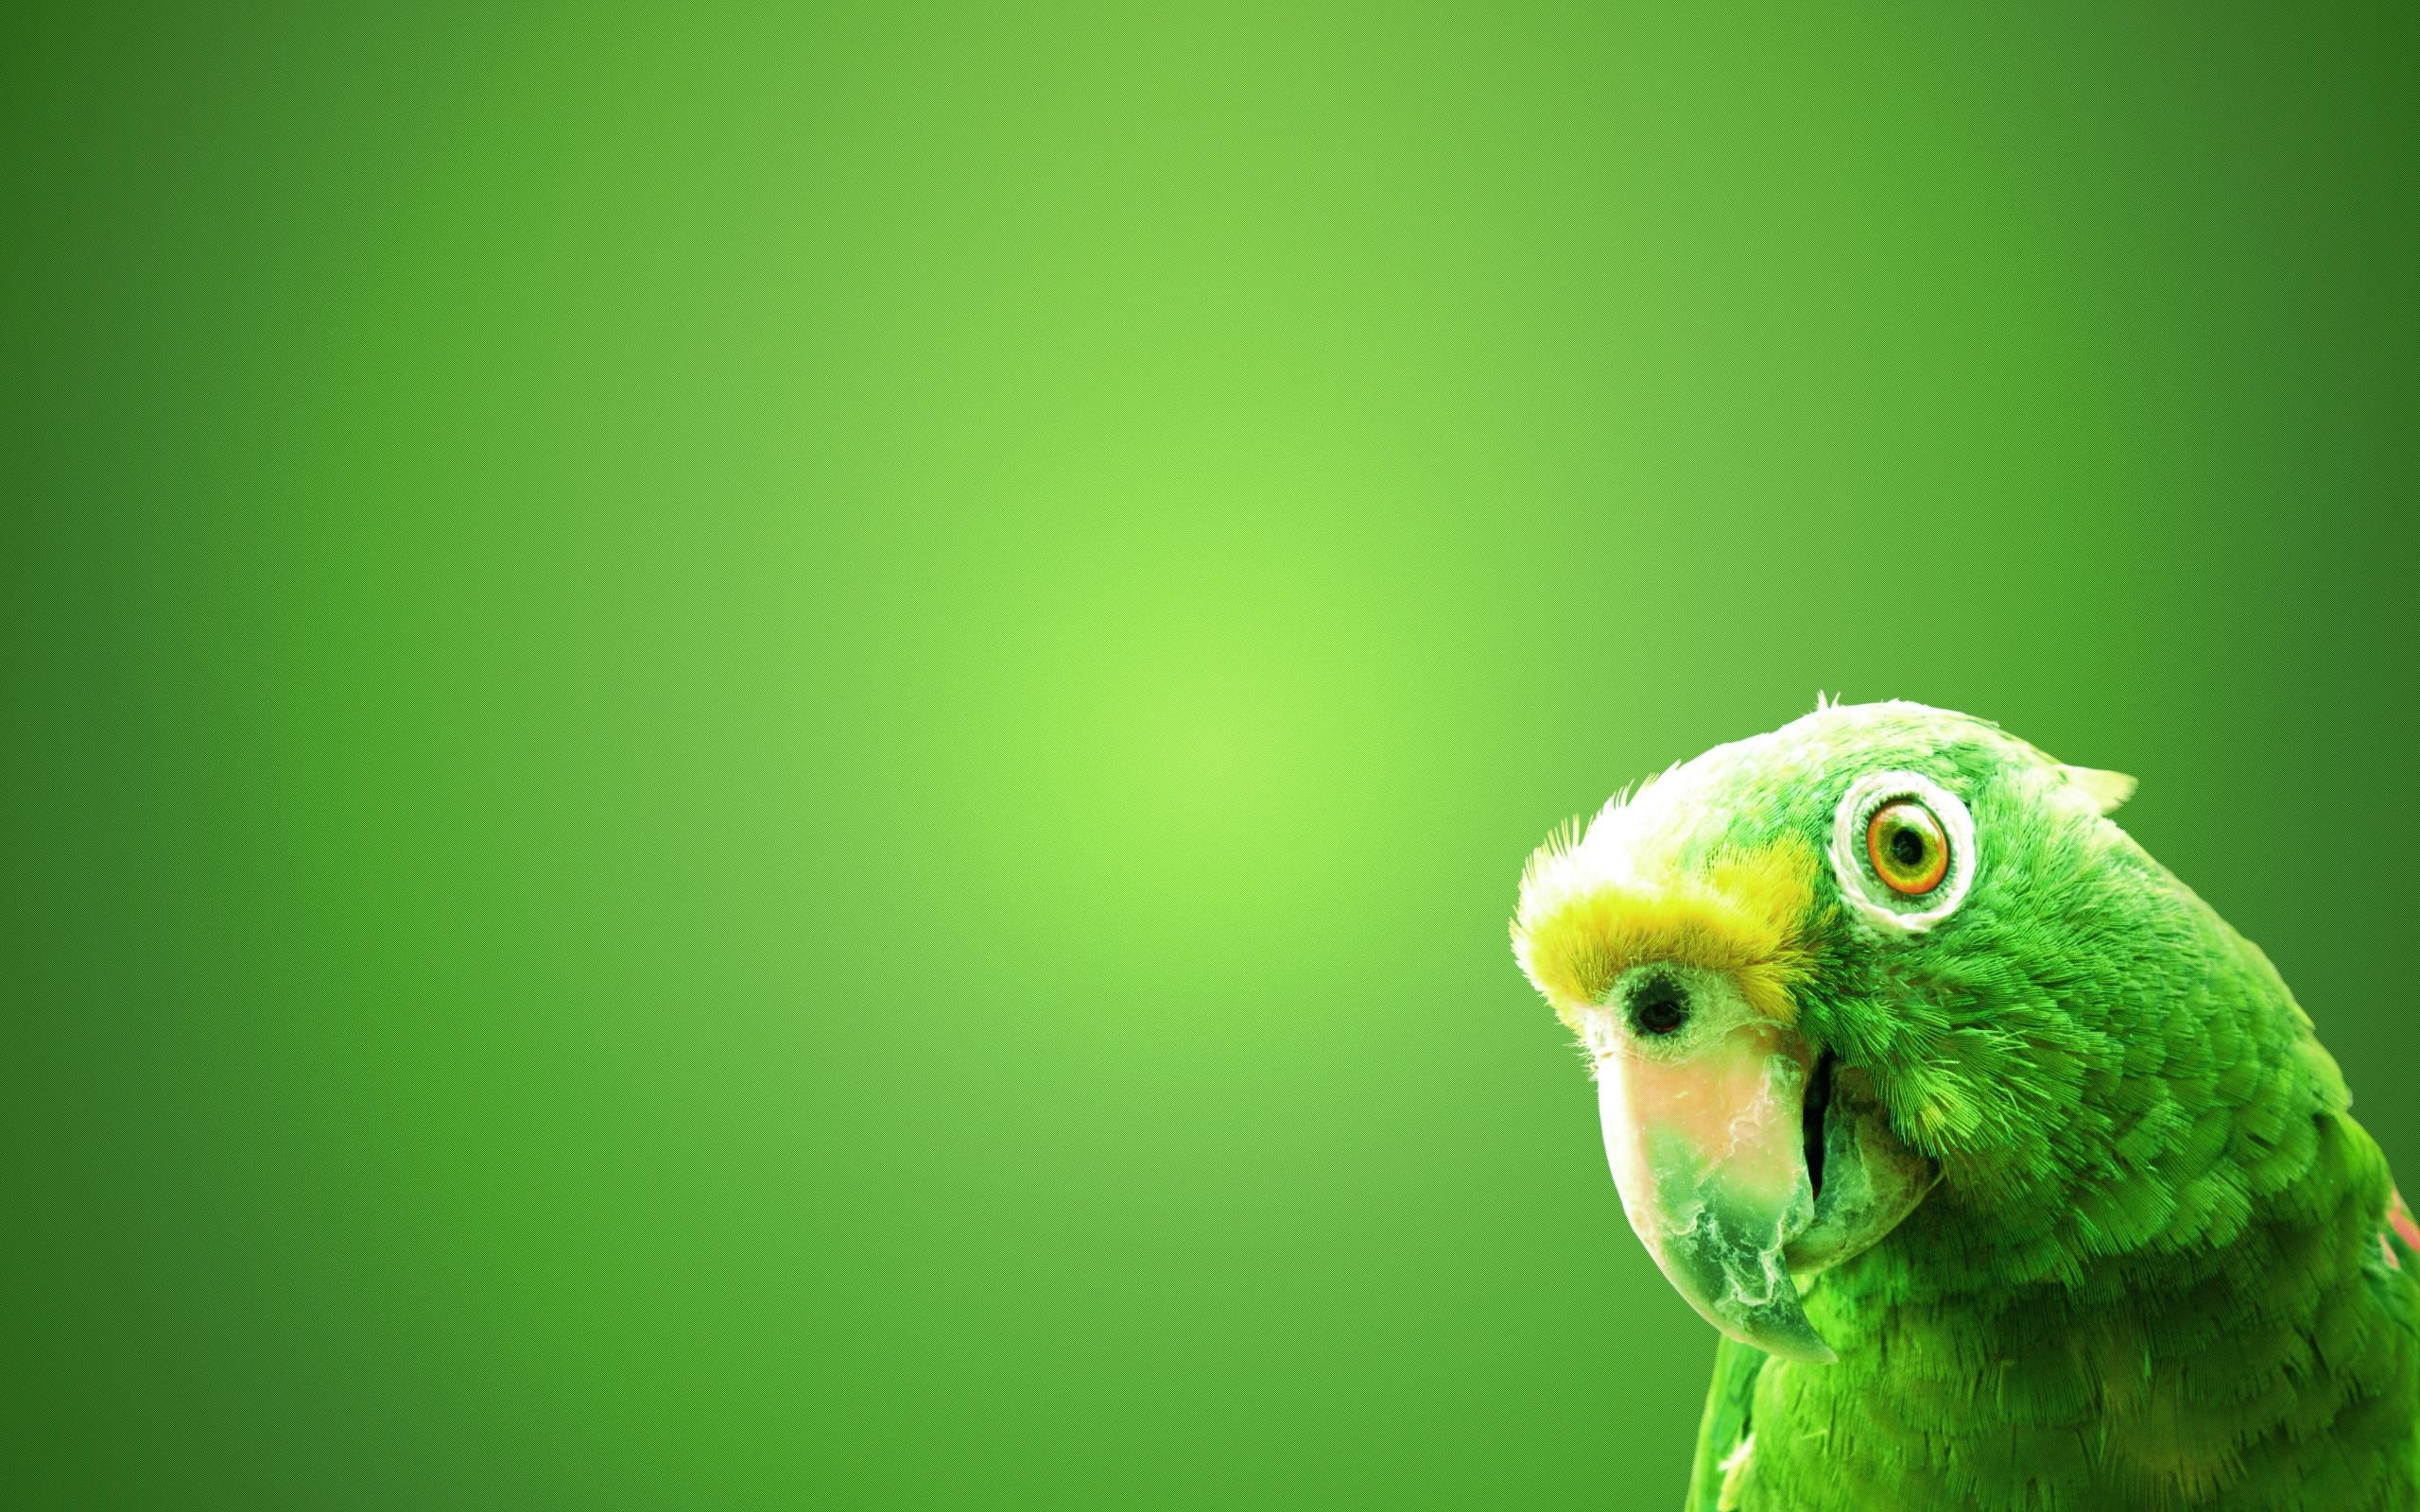 free wallpaper bird